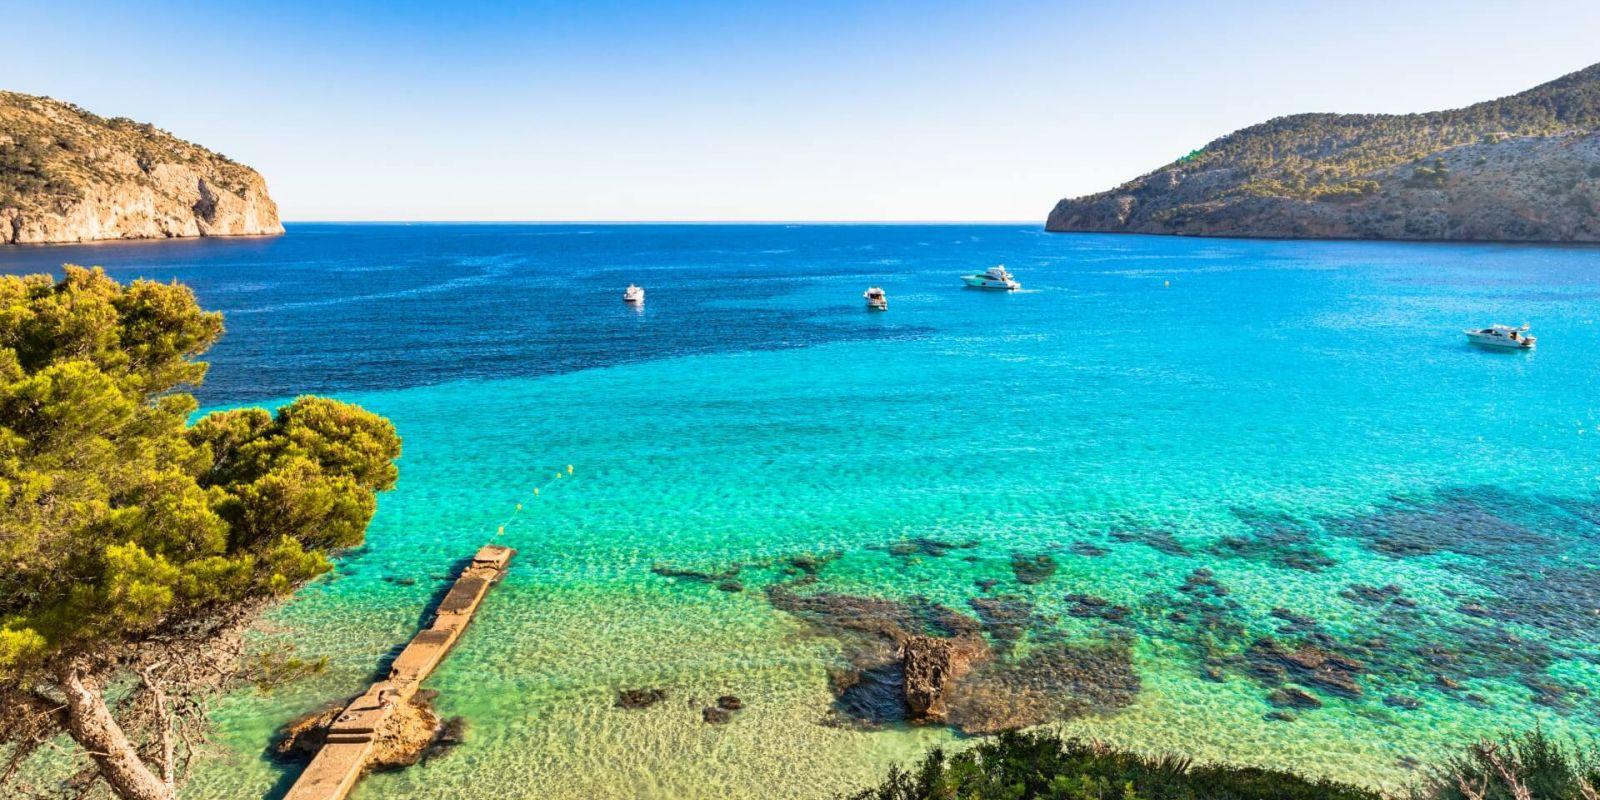 https://www.talamare.fr/medias/Location yacht Baléares, louer un yacht à Ibiza, Majorque, Minorque, Formentera